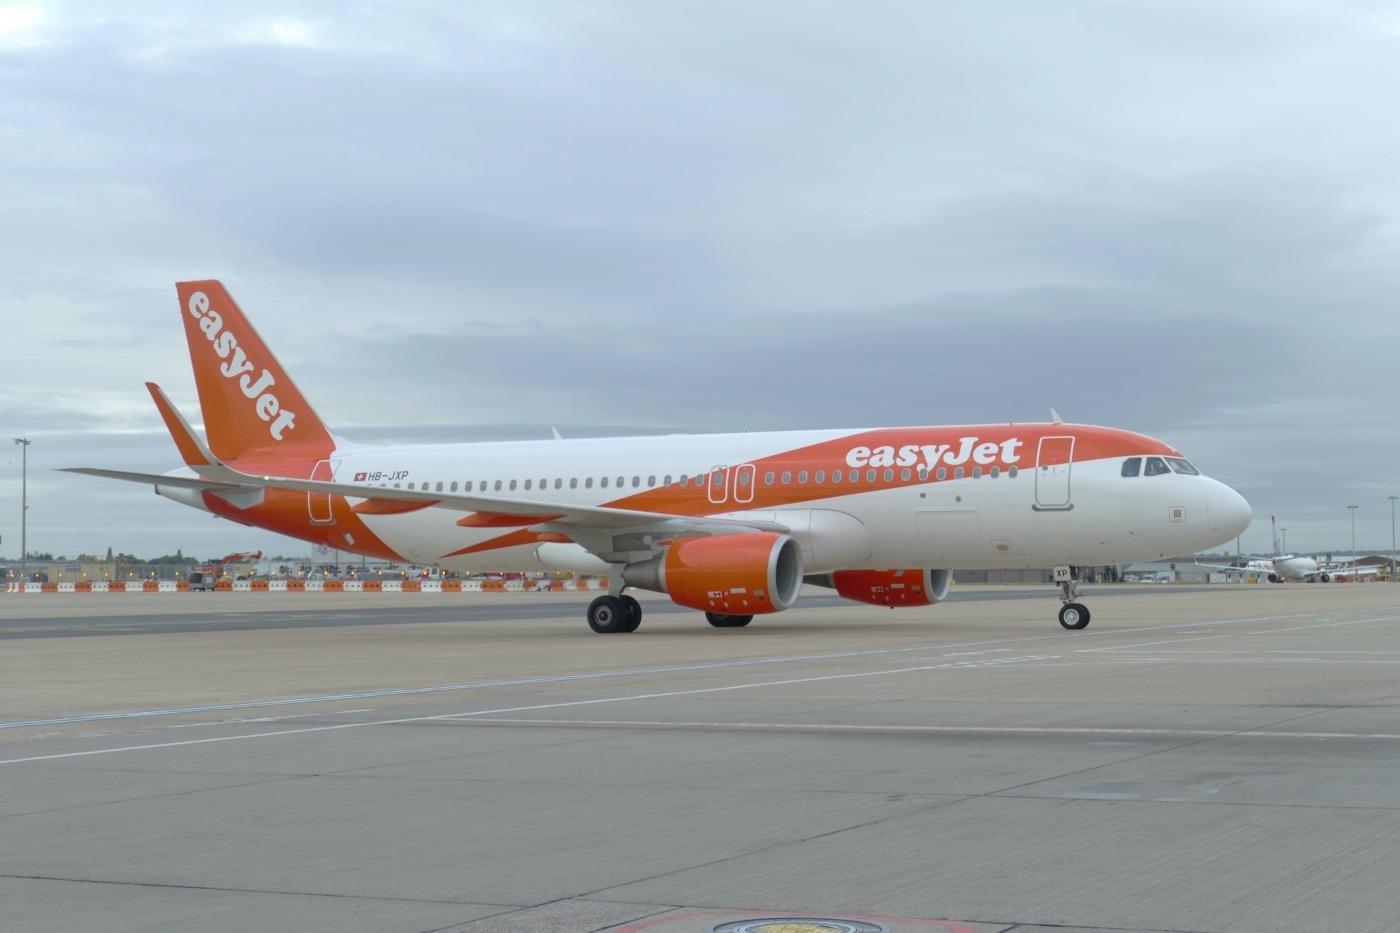 EasyJet Plane / Image: Unsplash